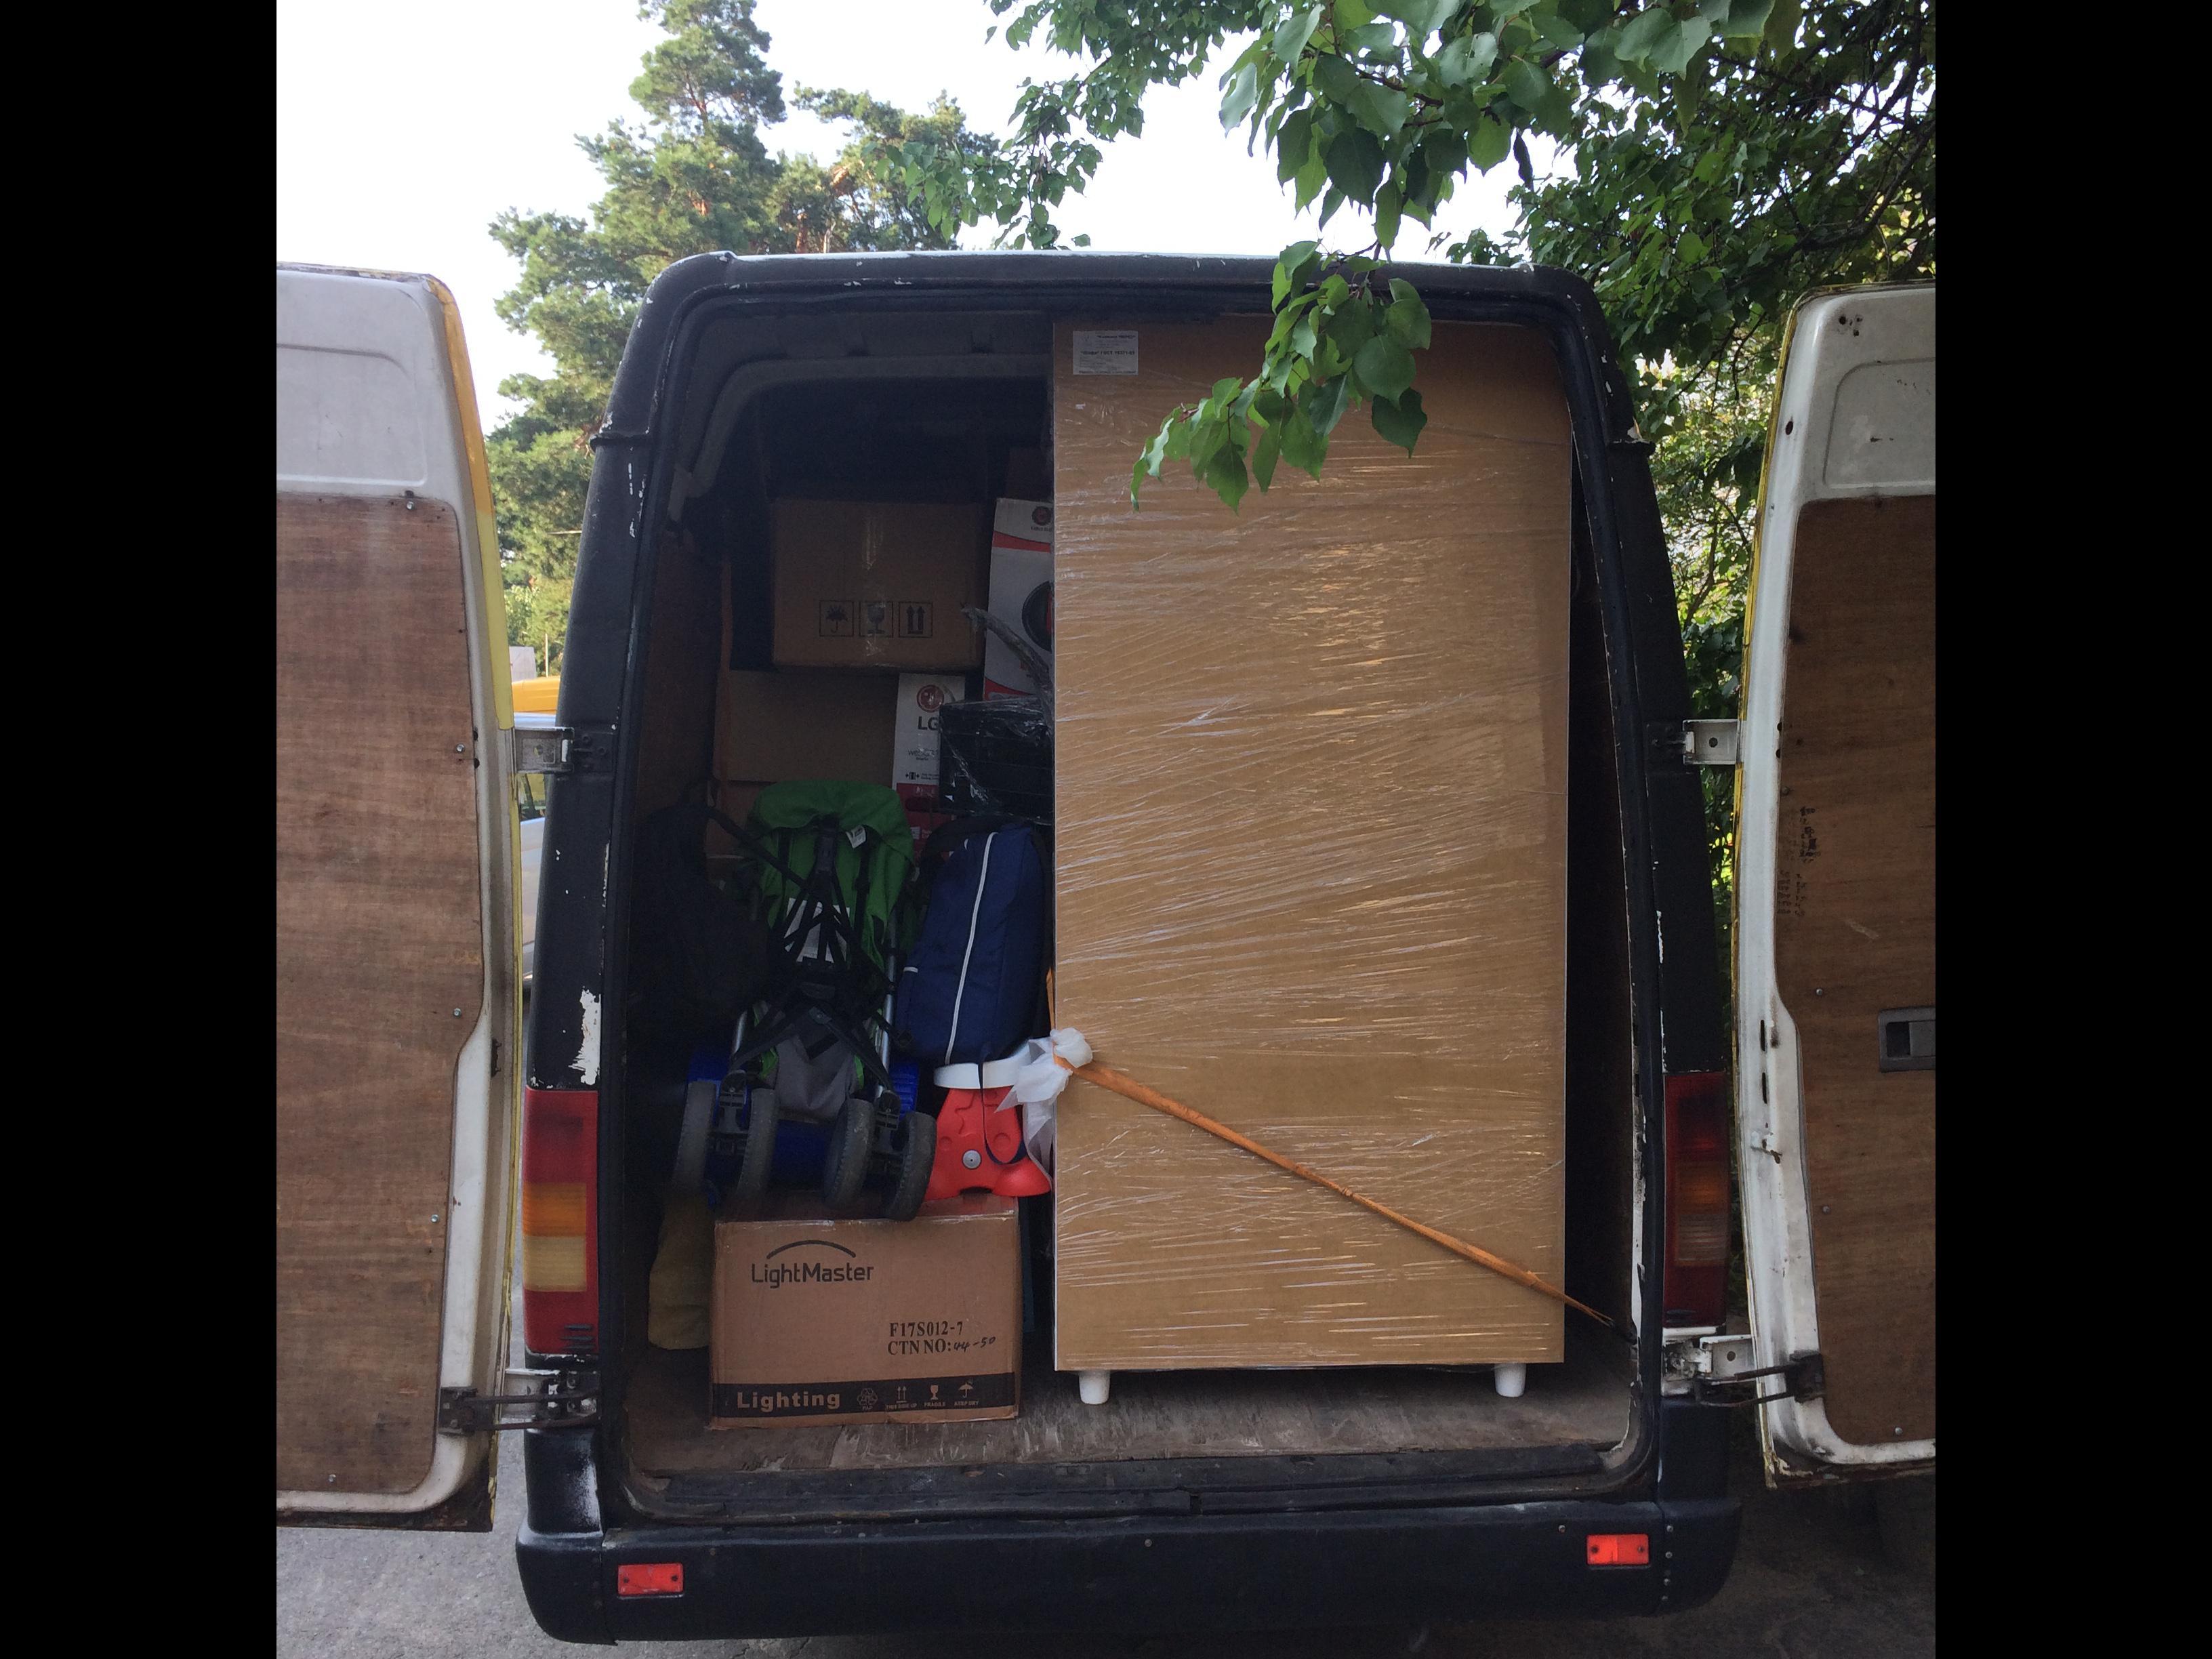 Фото Переезд 3-х комнатной квартиры (Спринтер) По желанию - вещи упаковываем (стрейч плёнка/коробки)